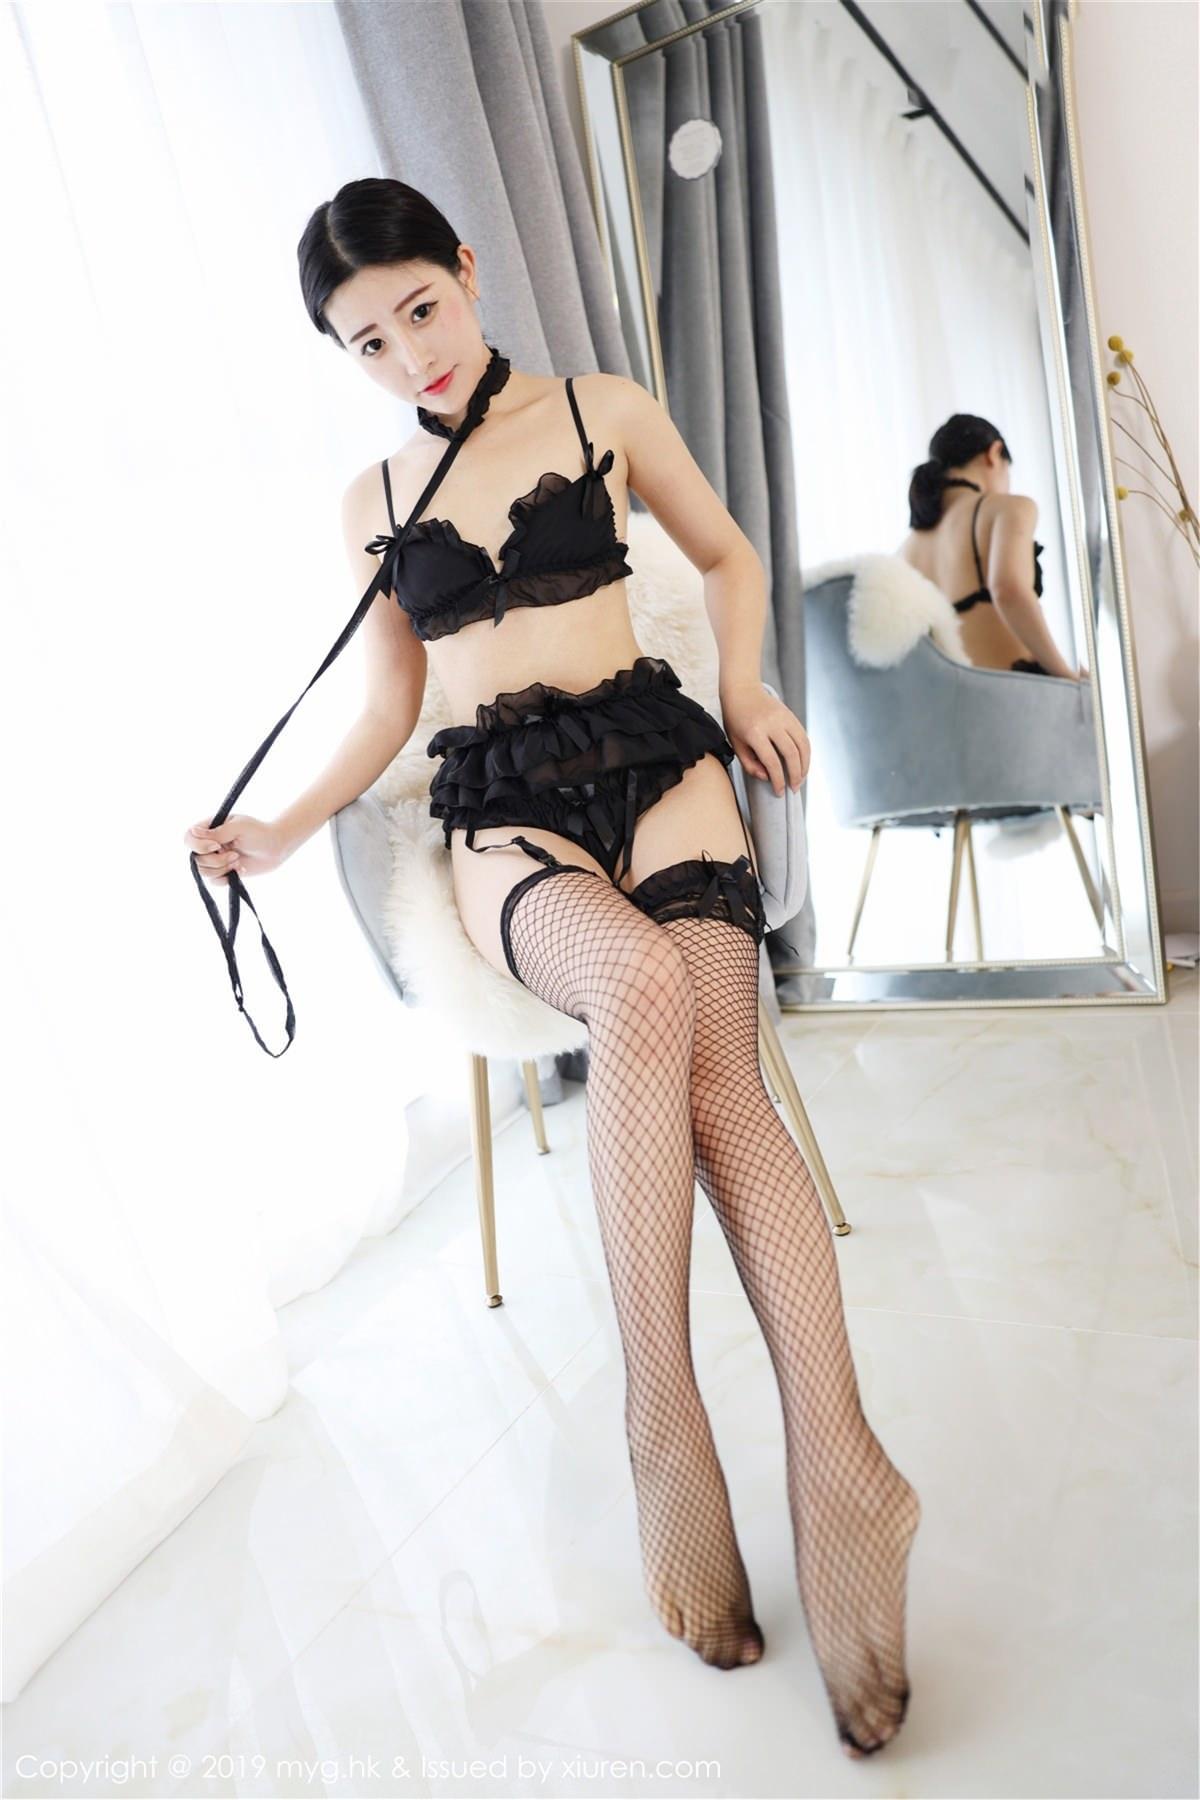 MyGirl Vol.358 2P, mygirl, Tong Dan Na